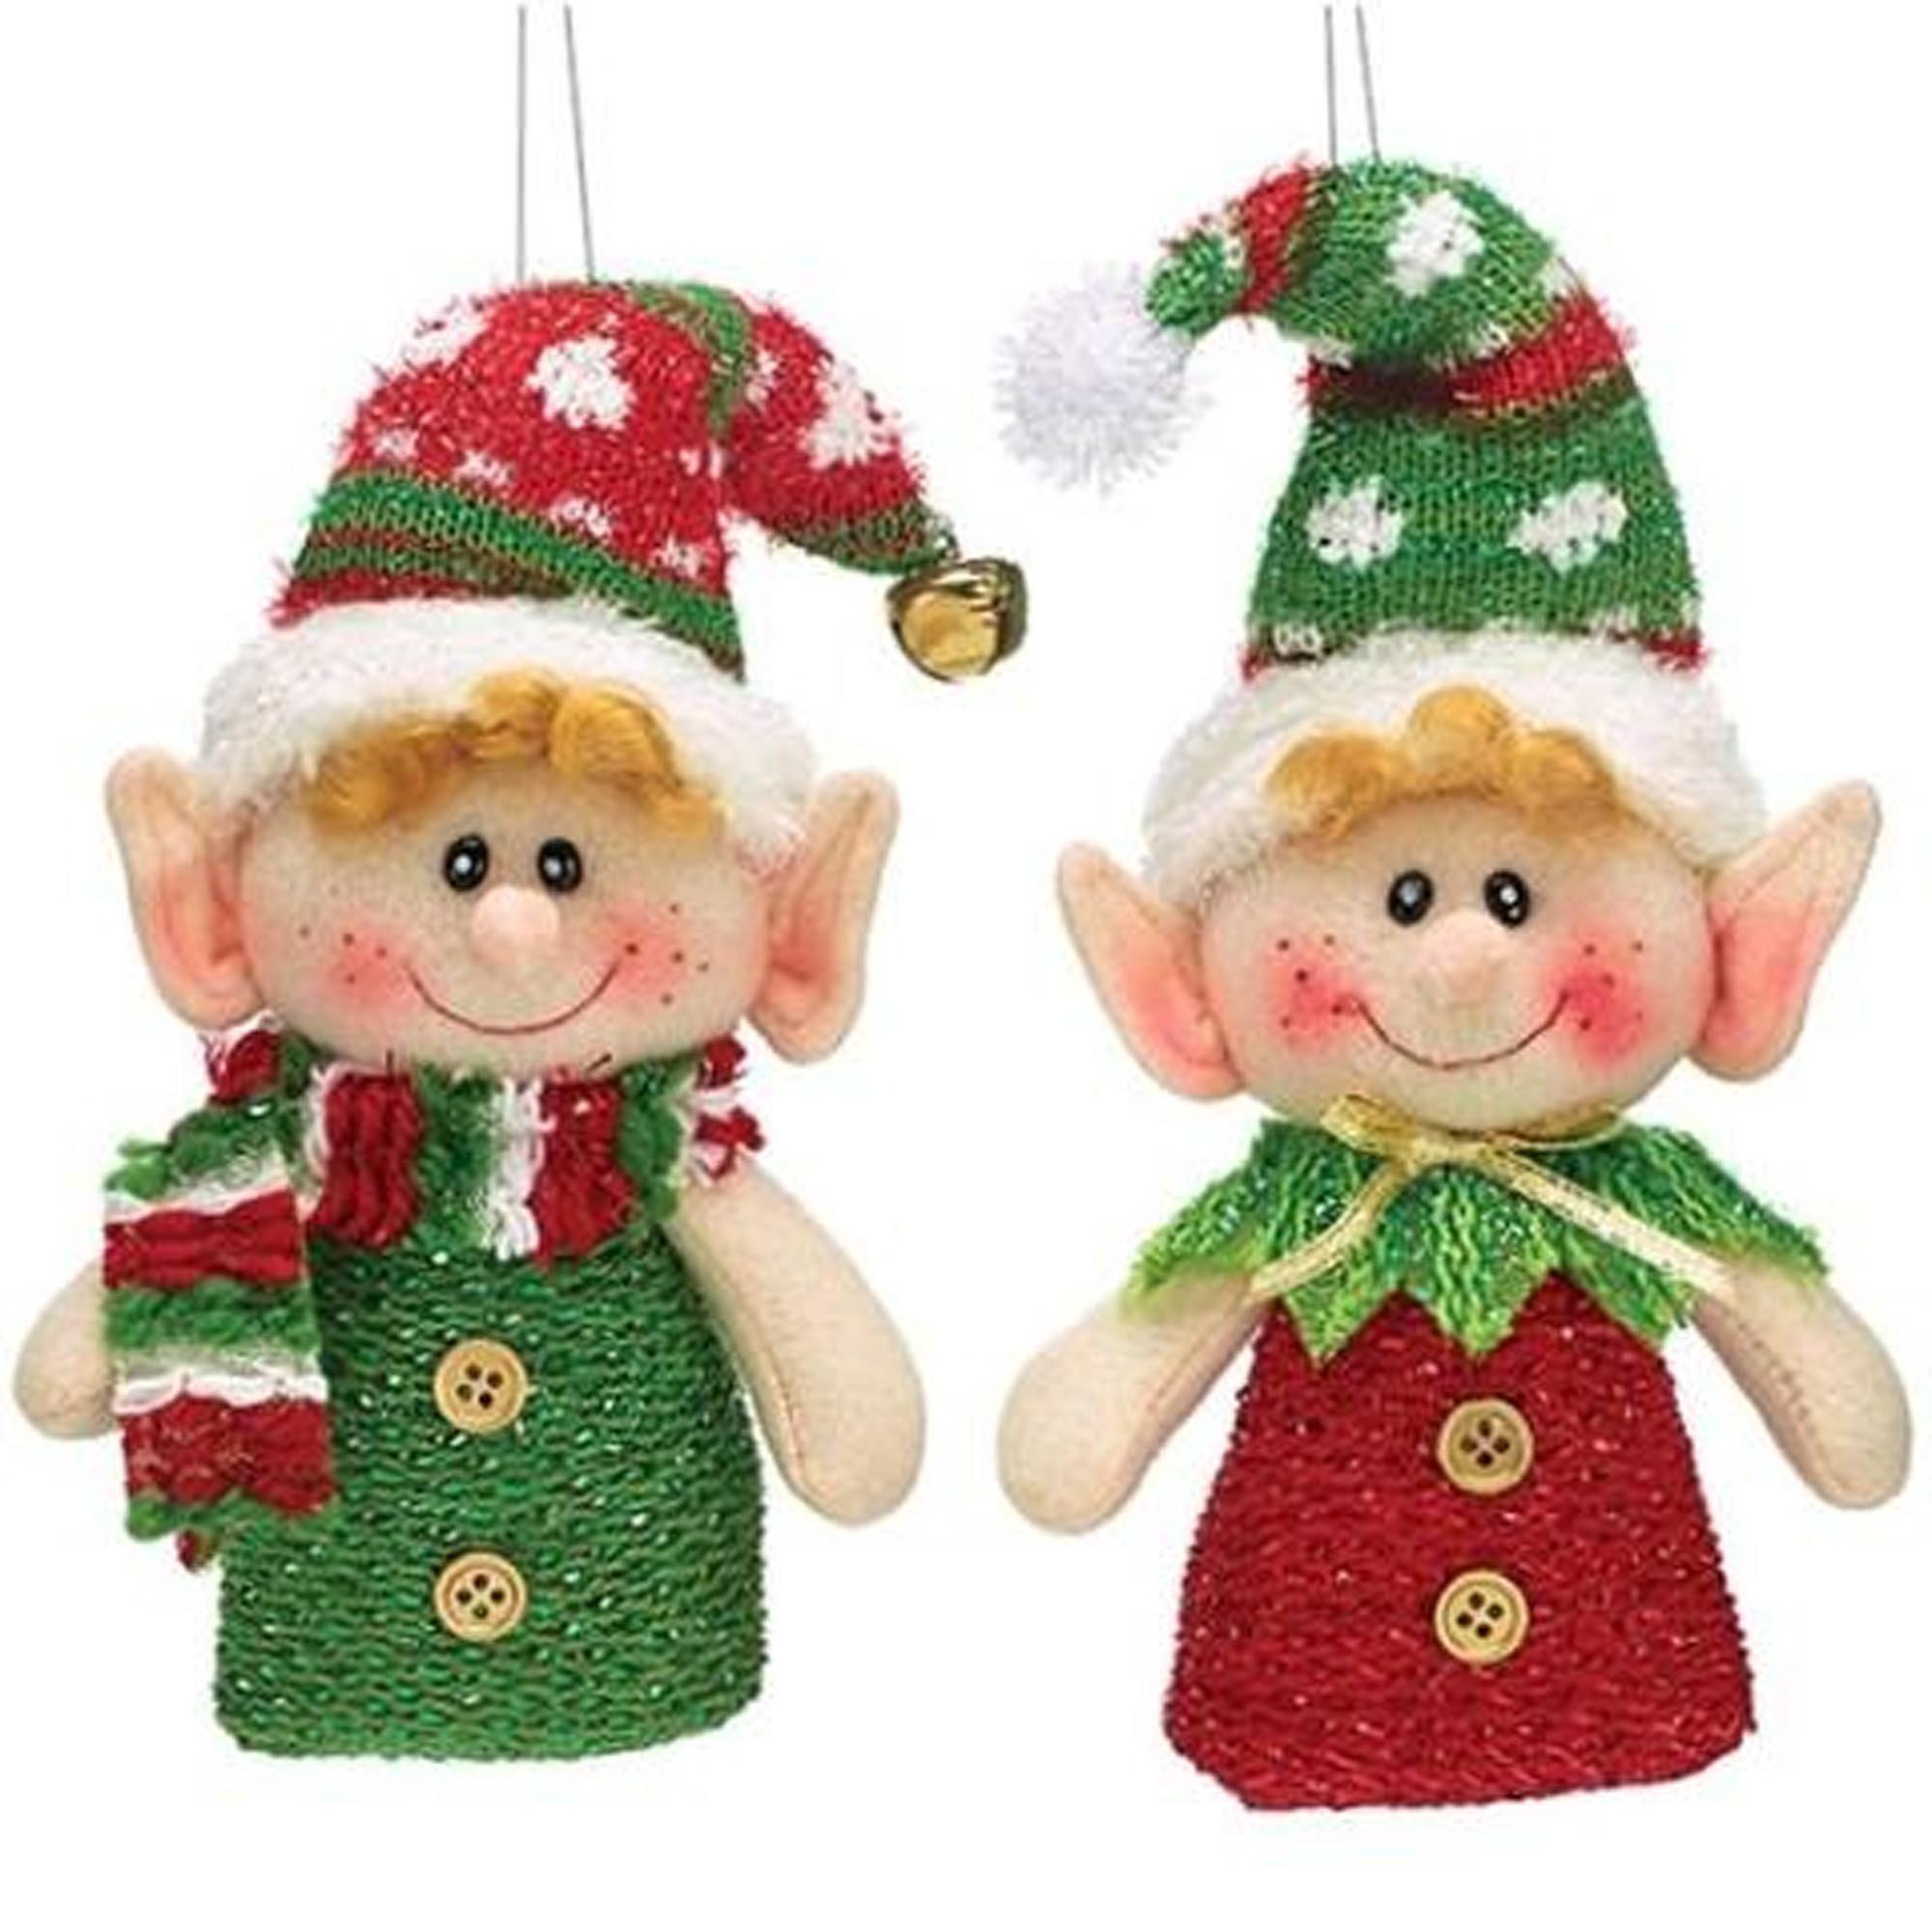 Image of Happy Christmas Elf Ornament Set